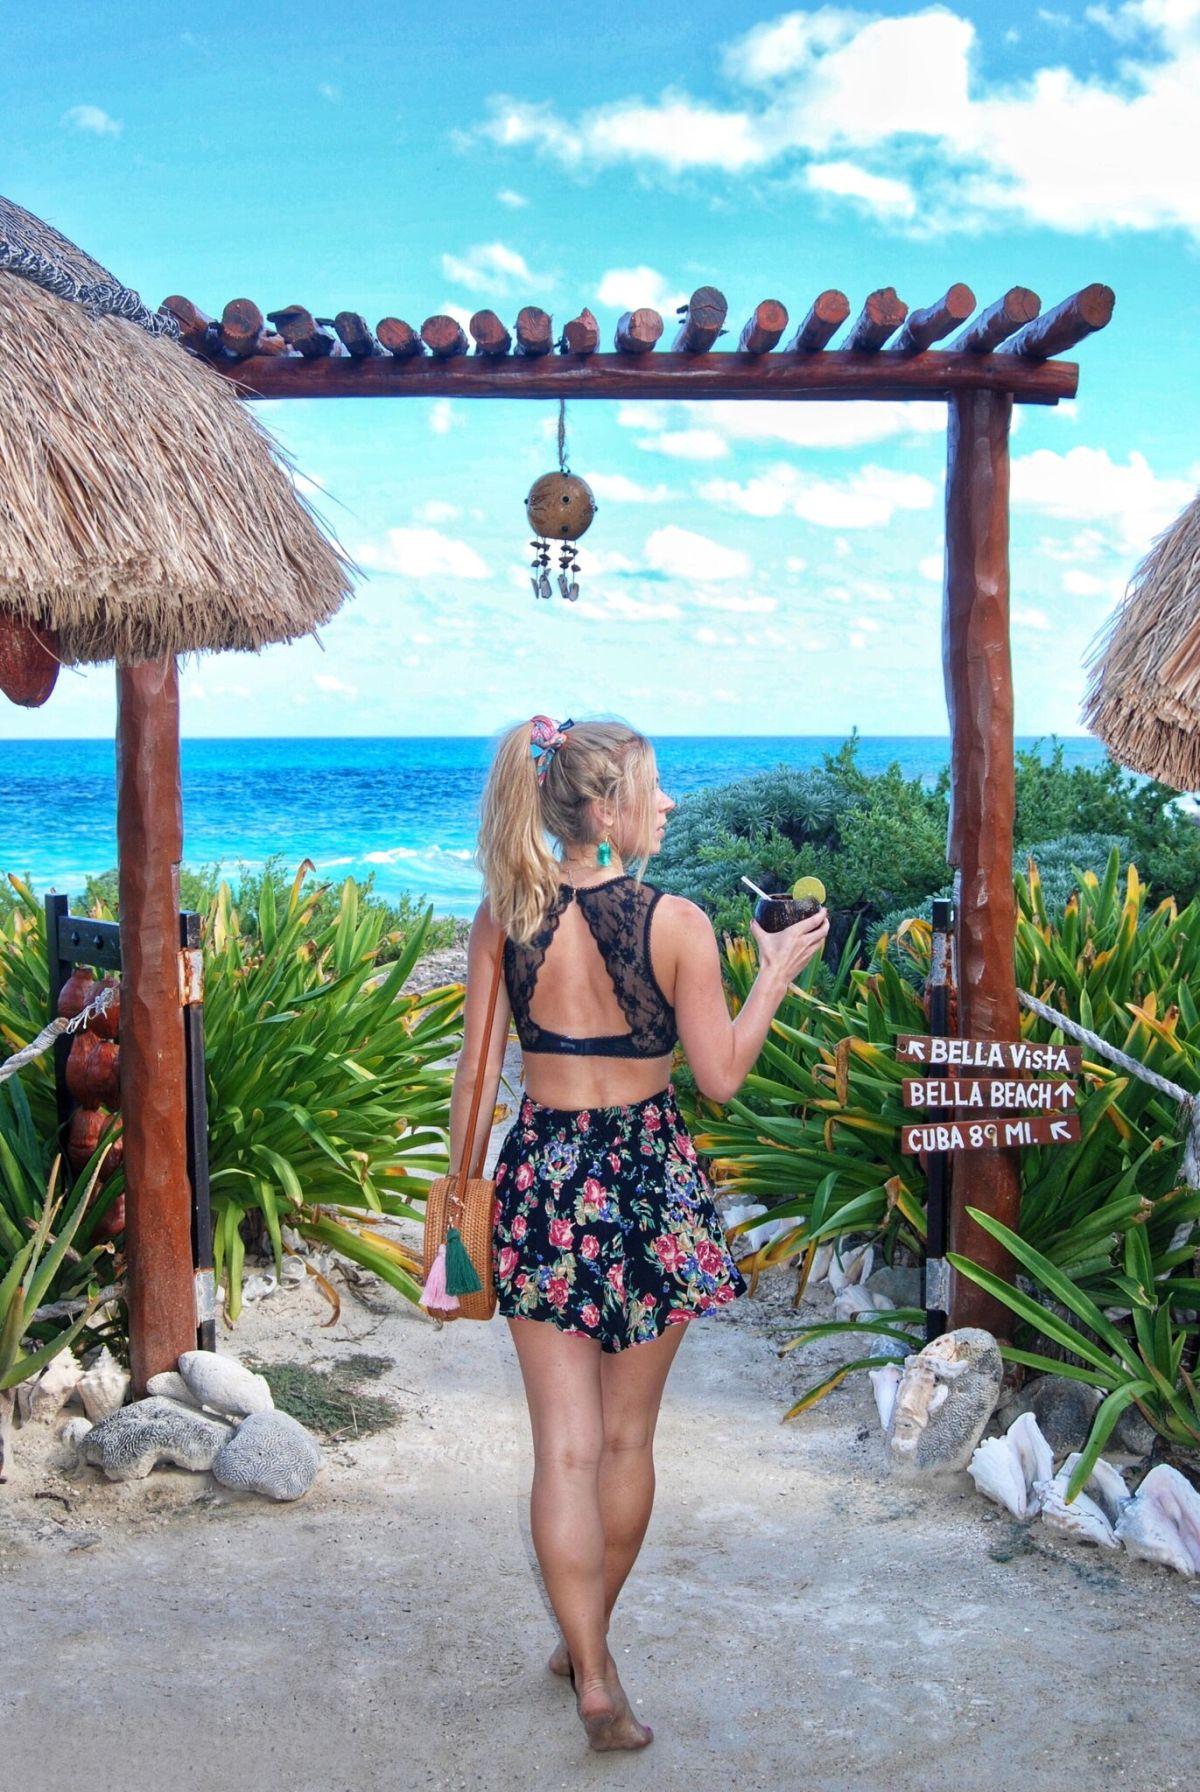 Isla Mujeres, Mexico: An Authentic IslandExperience